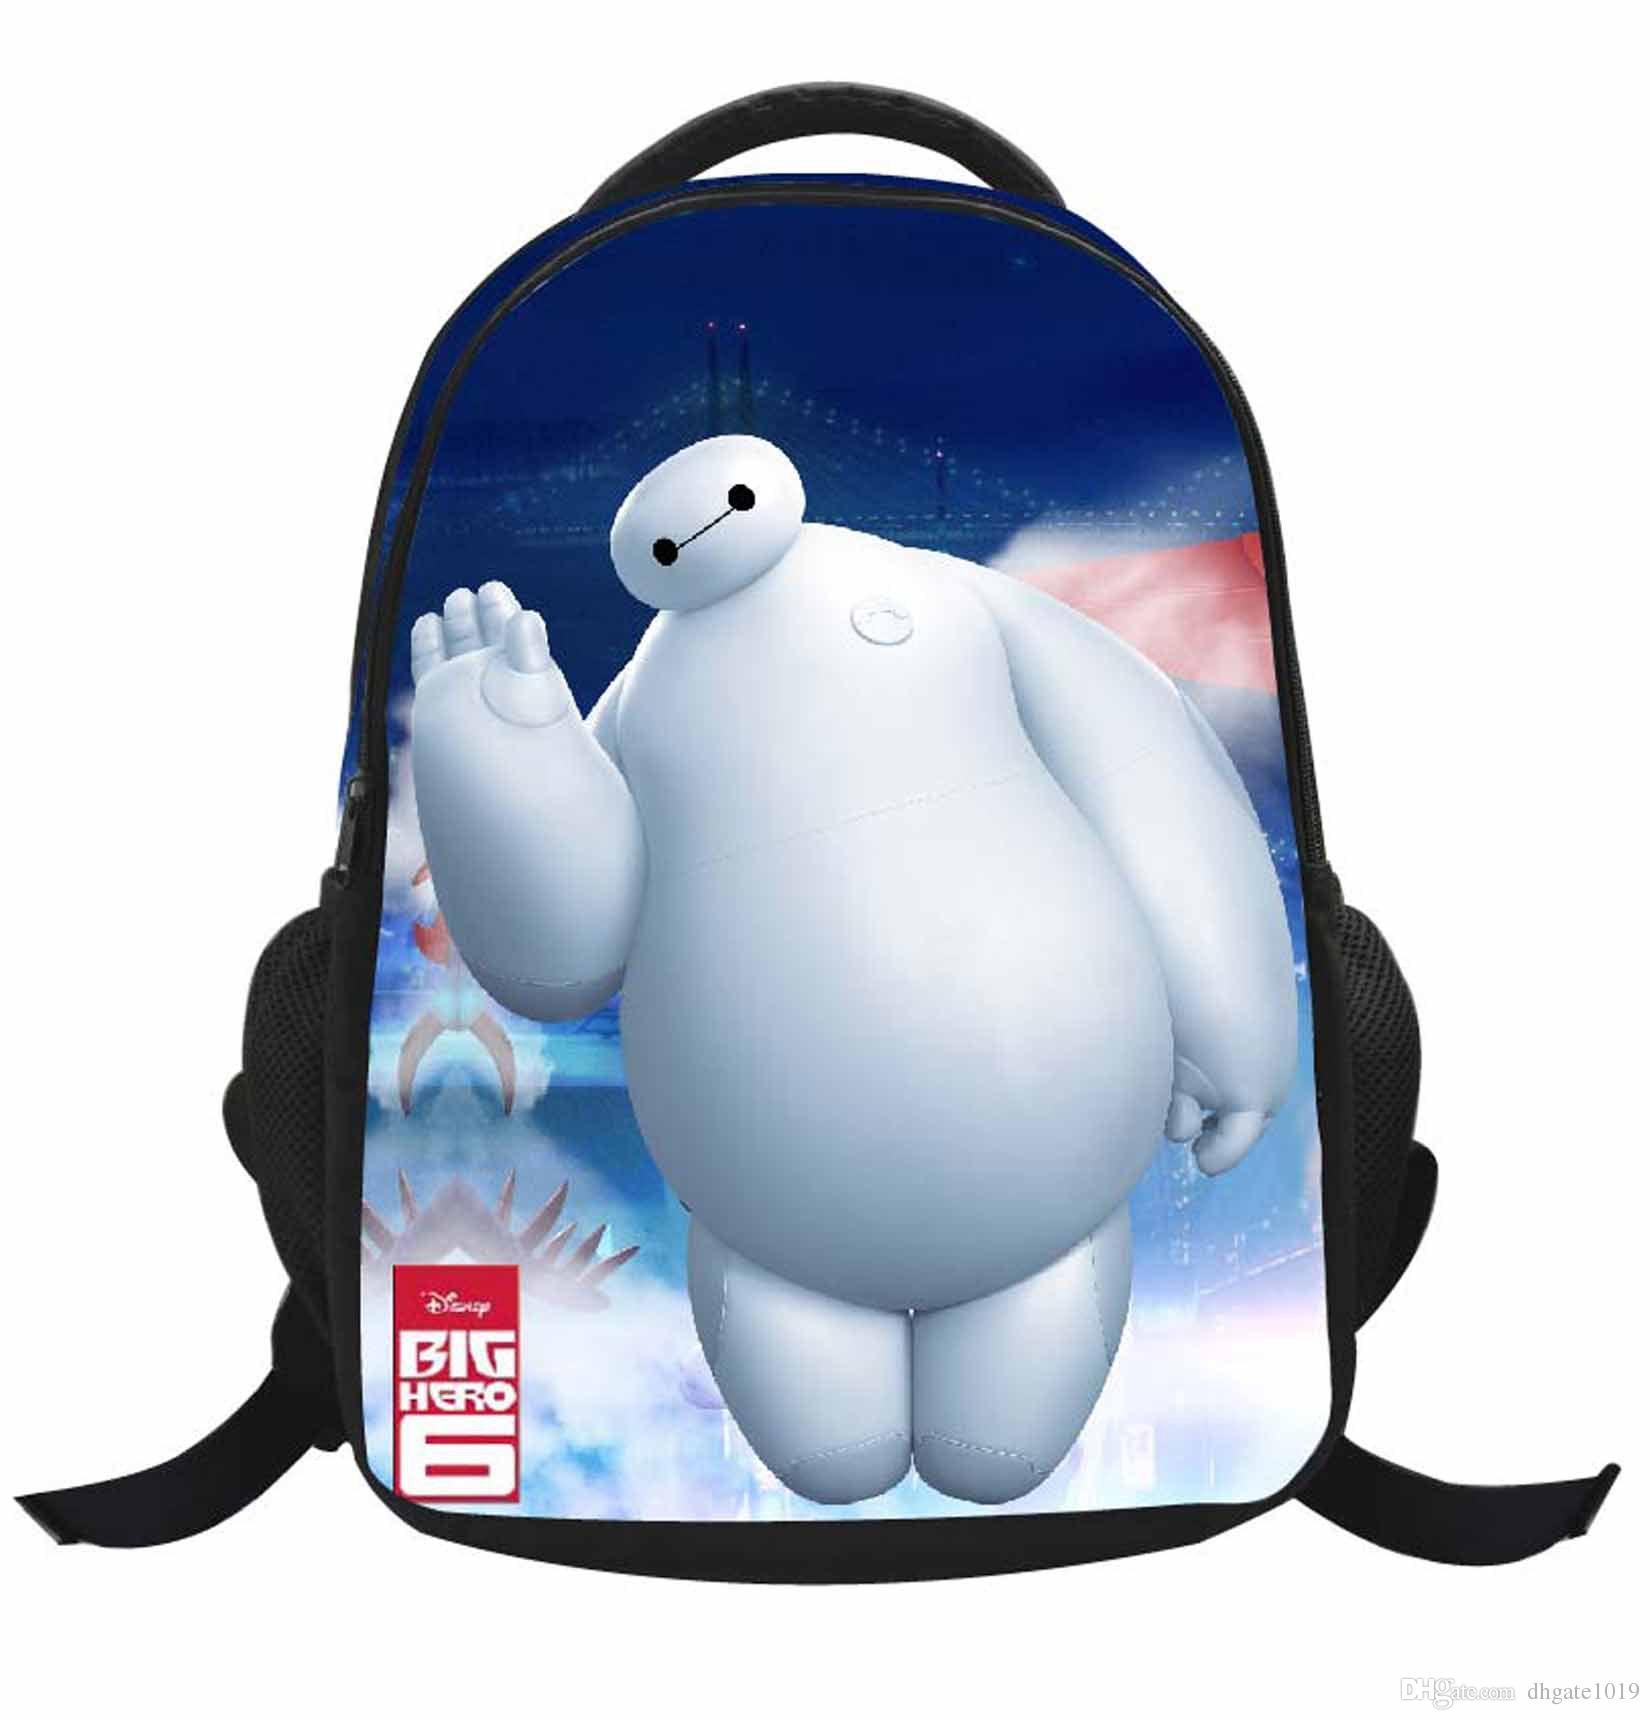 Bags for school on sale - Hot Sale New School Bags Big Hero 6 Baymax Cartoon School Backpacks Mochila Children S Bags Infantil Kindergarten Book Bags For Kids Boys Fashion Bags